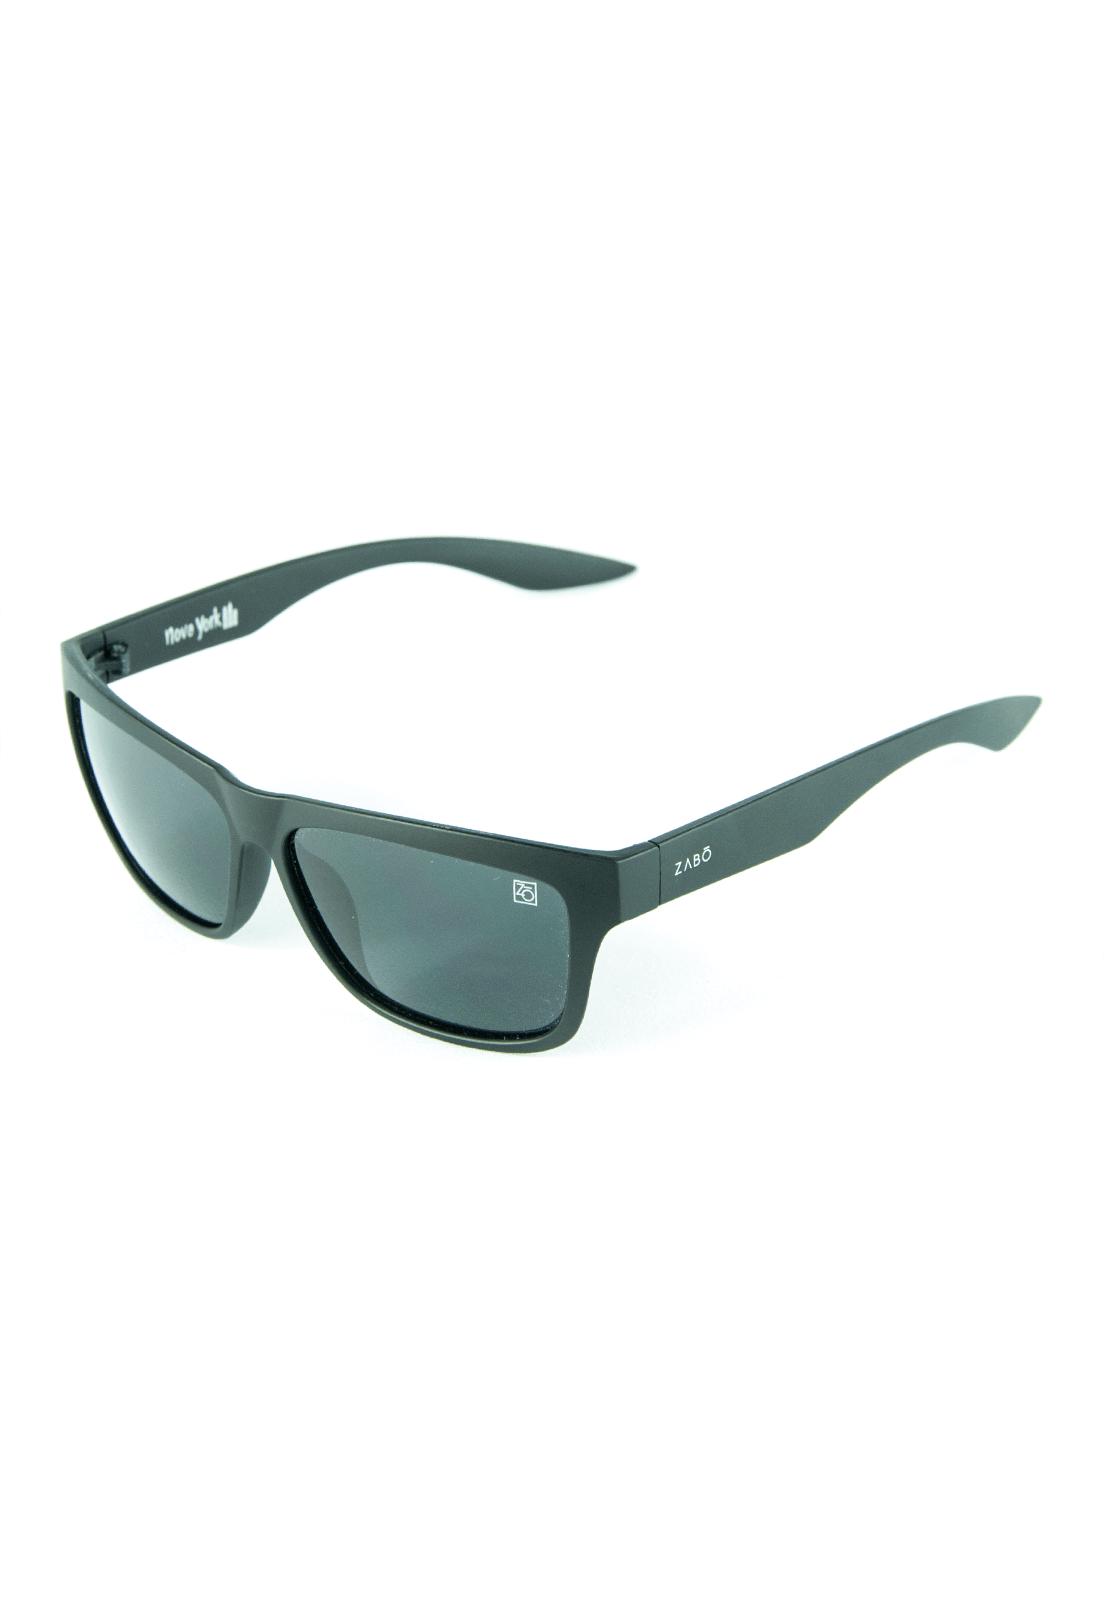 Óculos de Sol Polarizado Zabô Nova York Preto